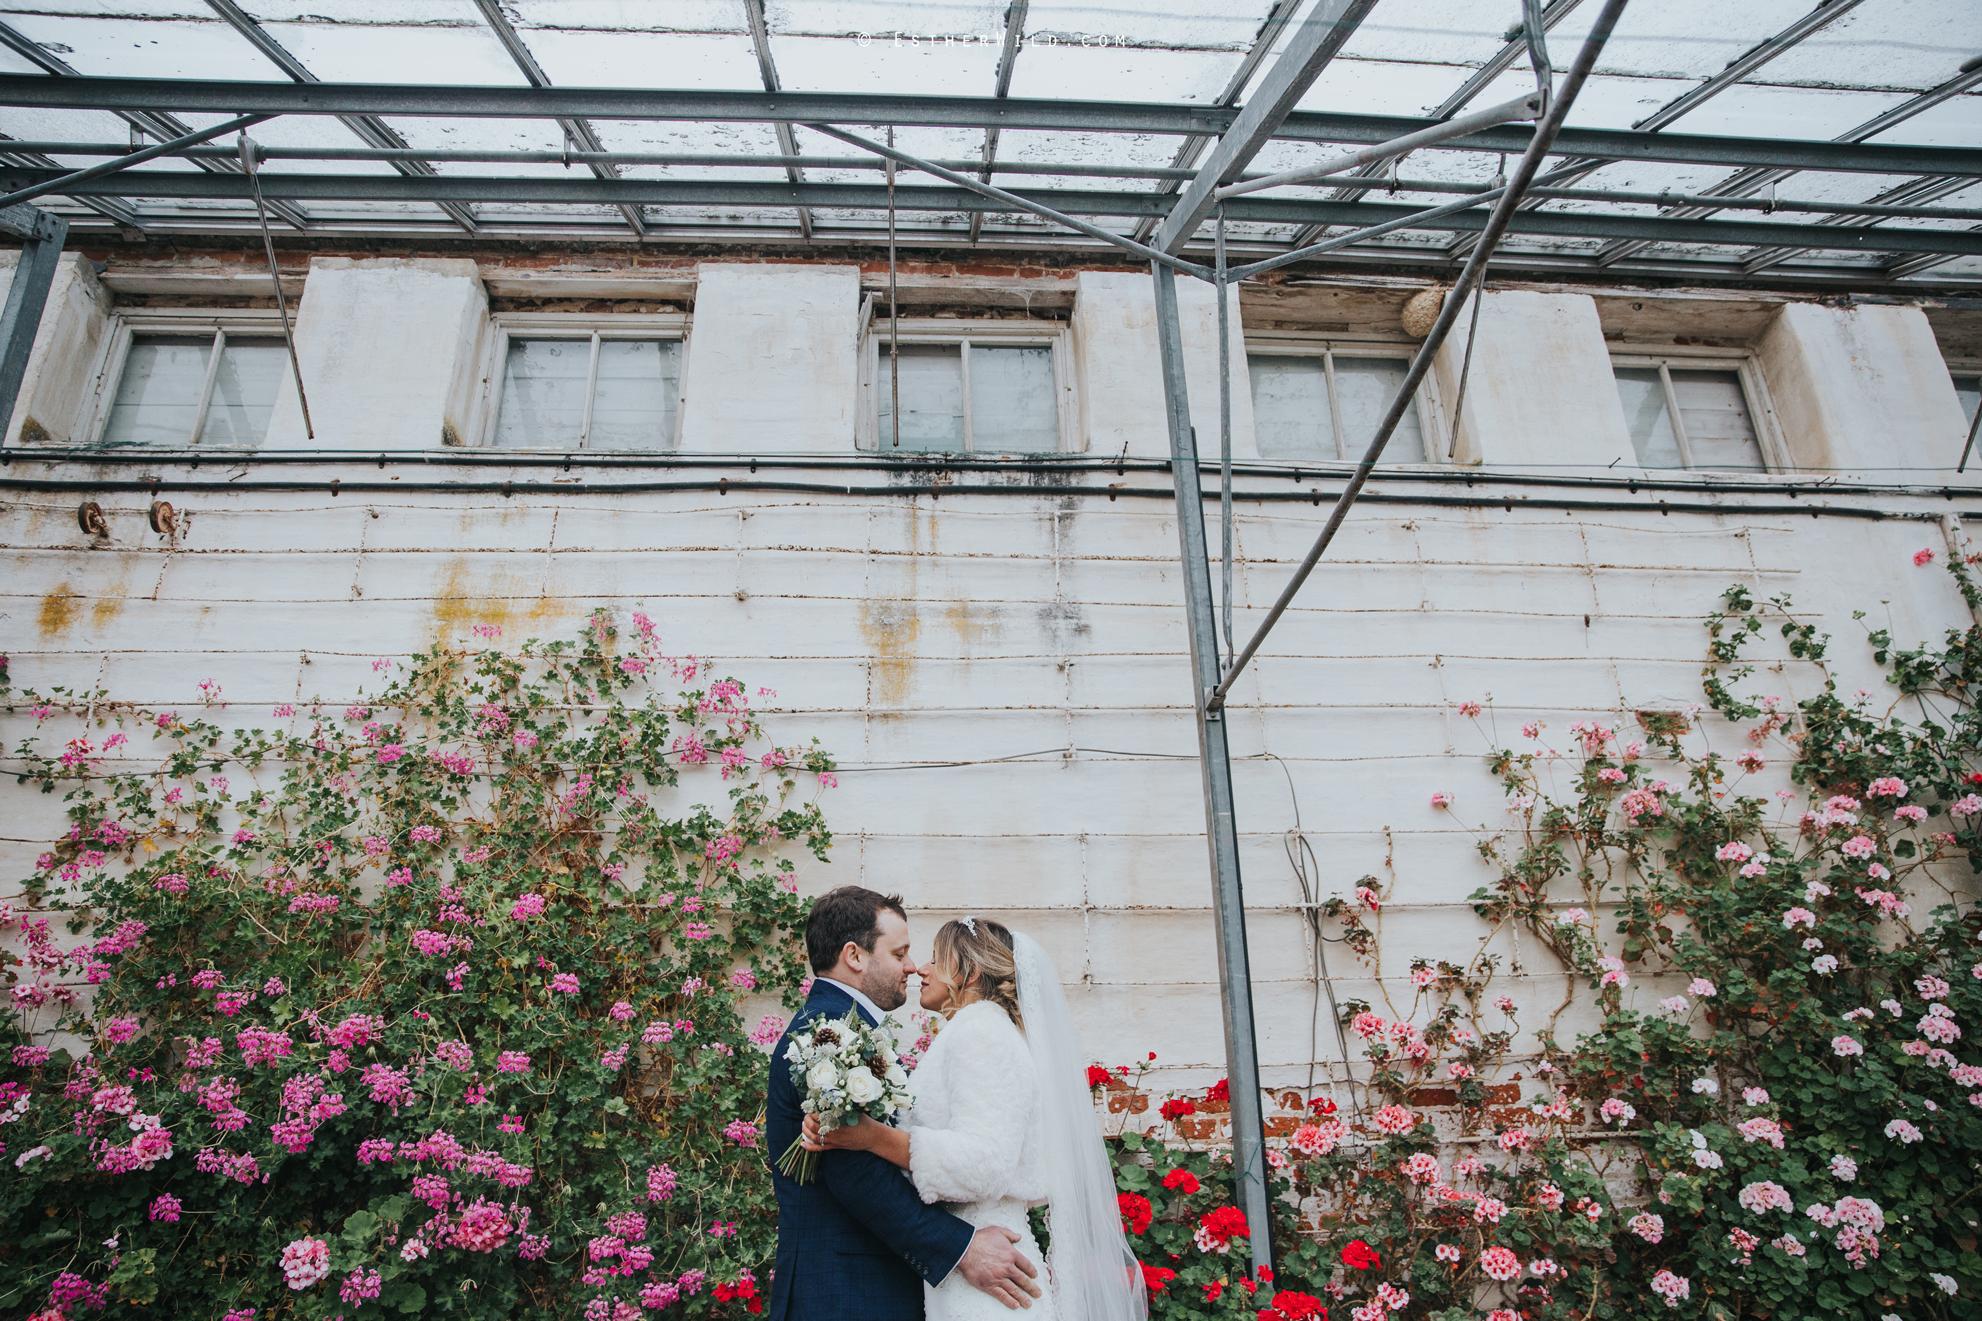 Wedding_Photography_Diss_Gawdy_Hall_Redenhall_Church_Norfolk_Winter_Esther_Wild_Copyright_IMG_1756-2.jpg